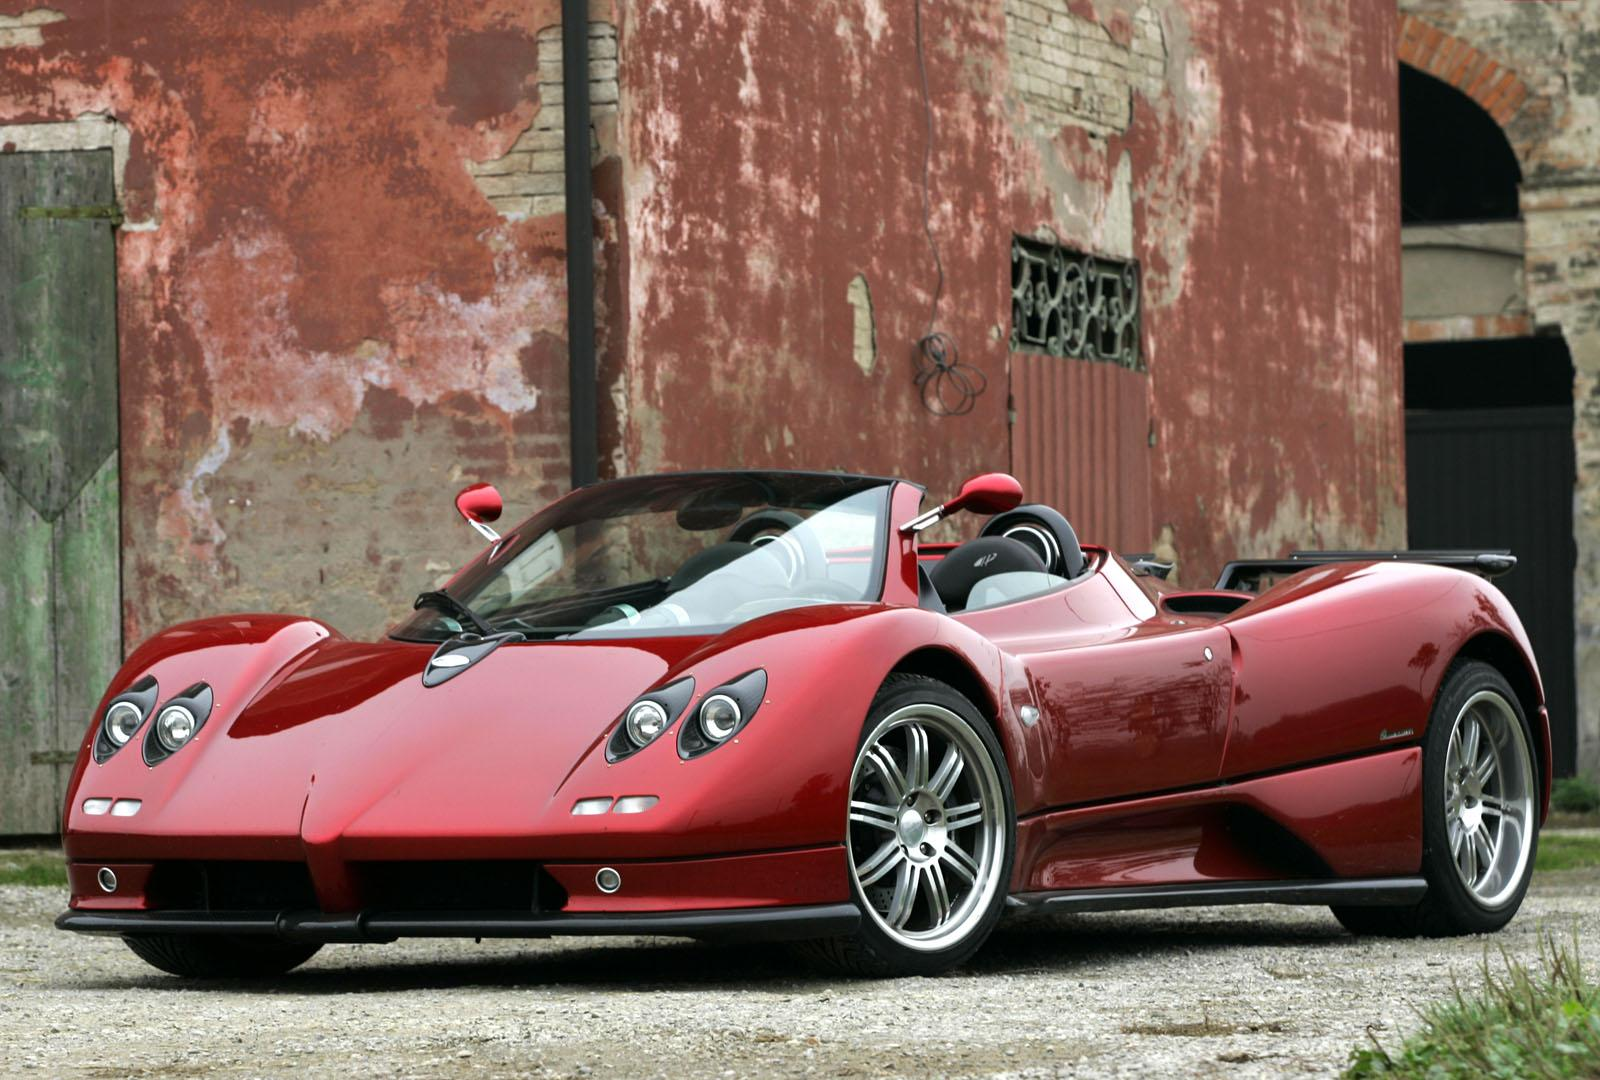 World Of Cars Pagani Zonda Cinque Roadster